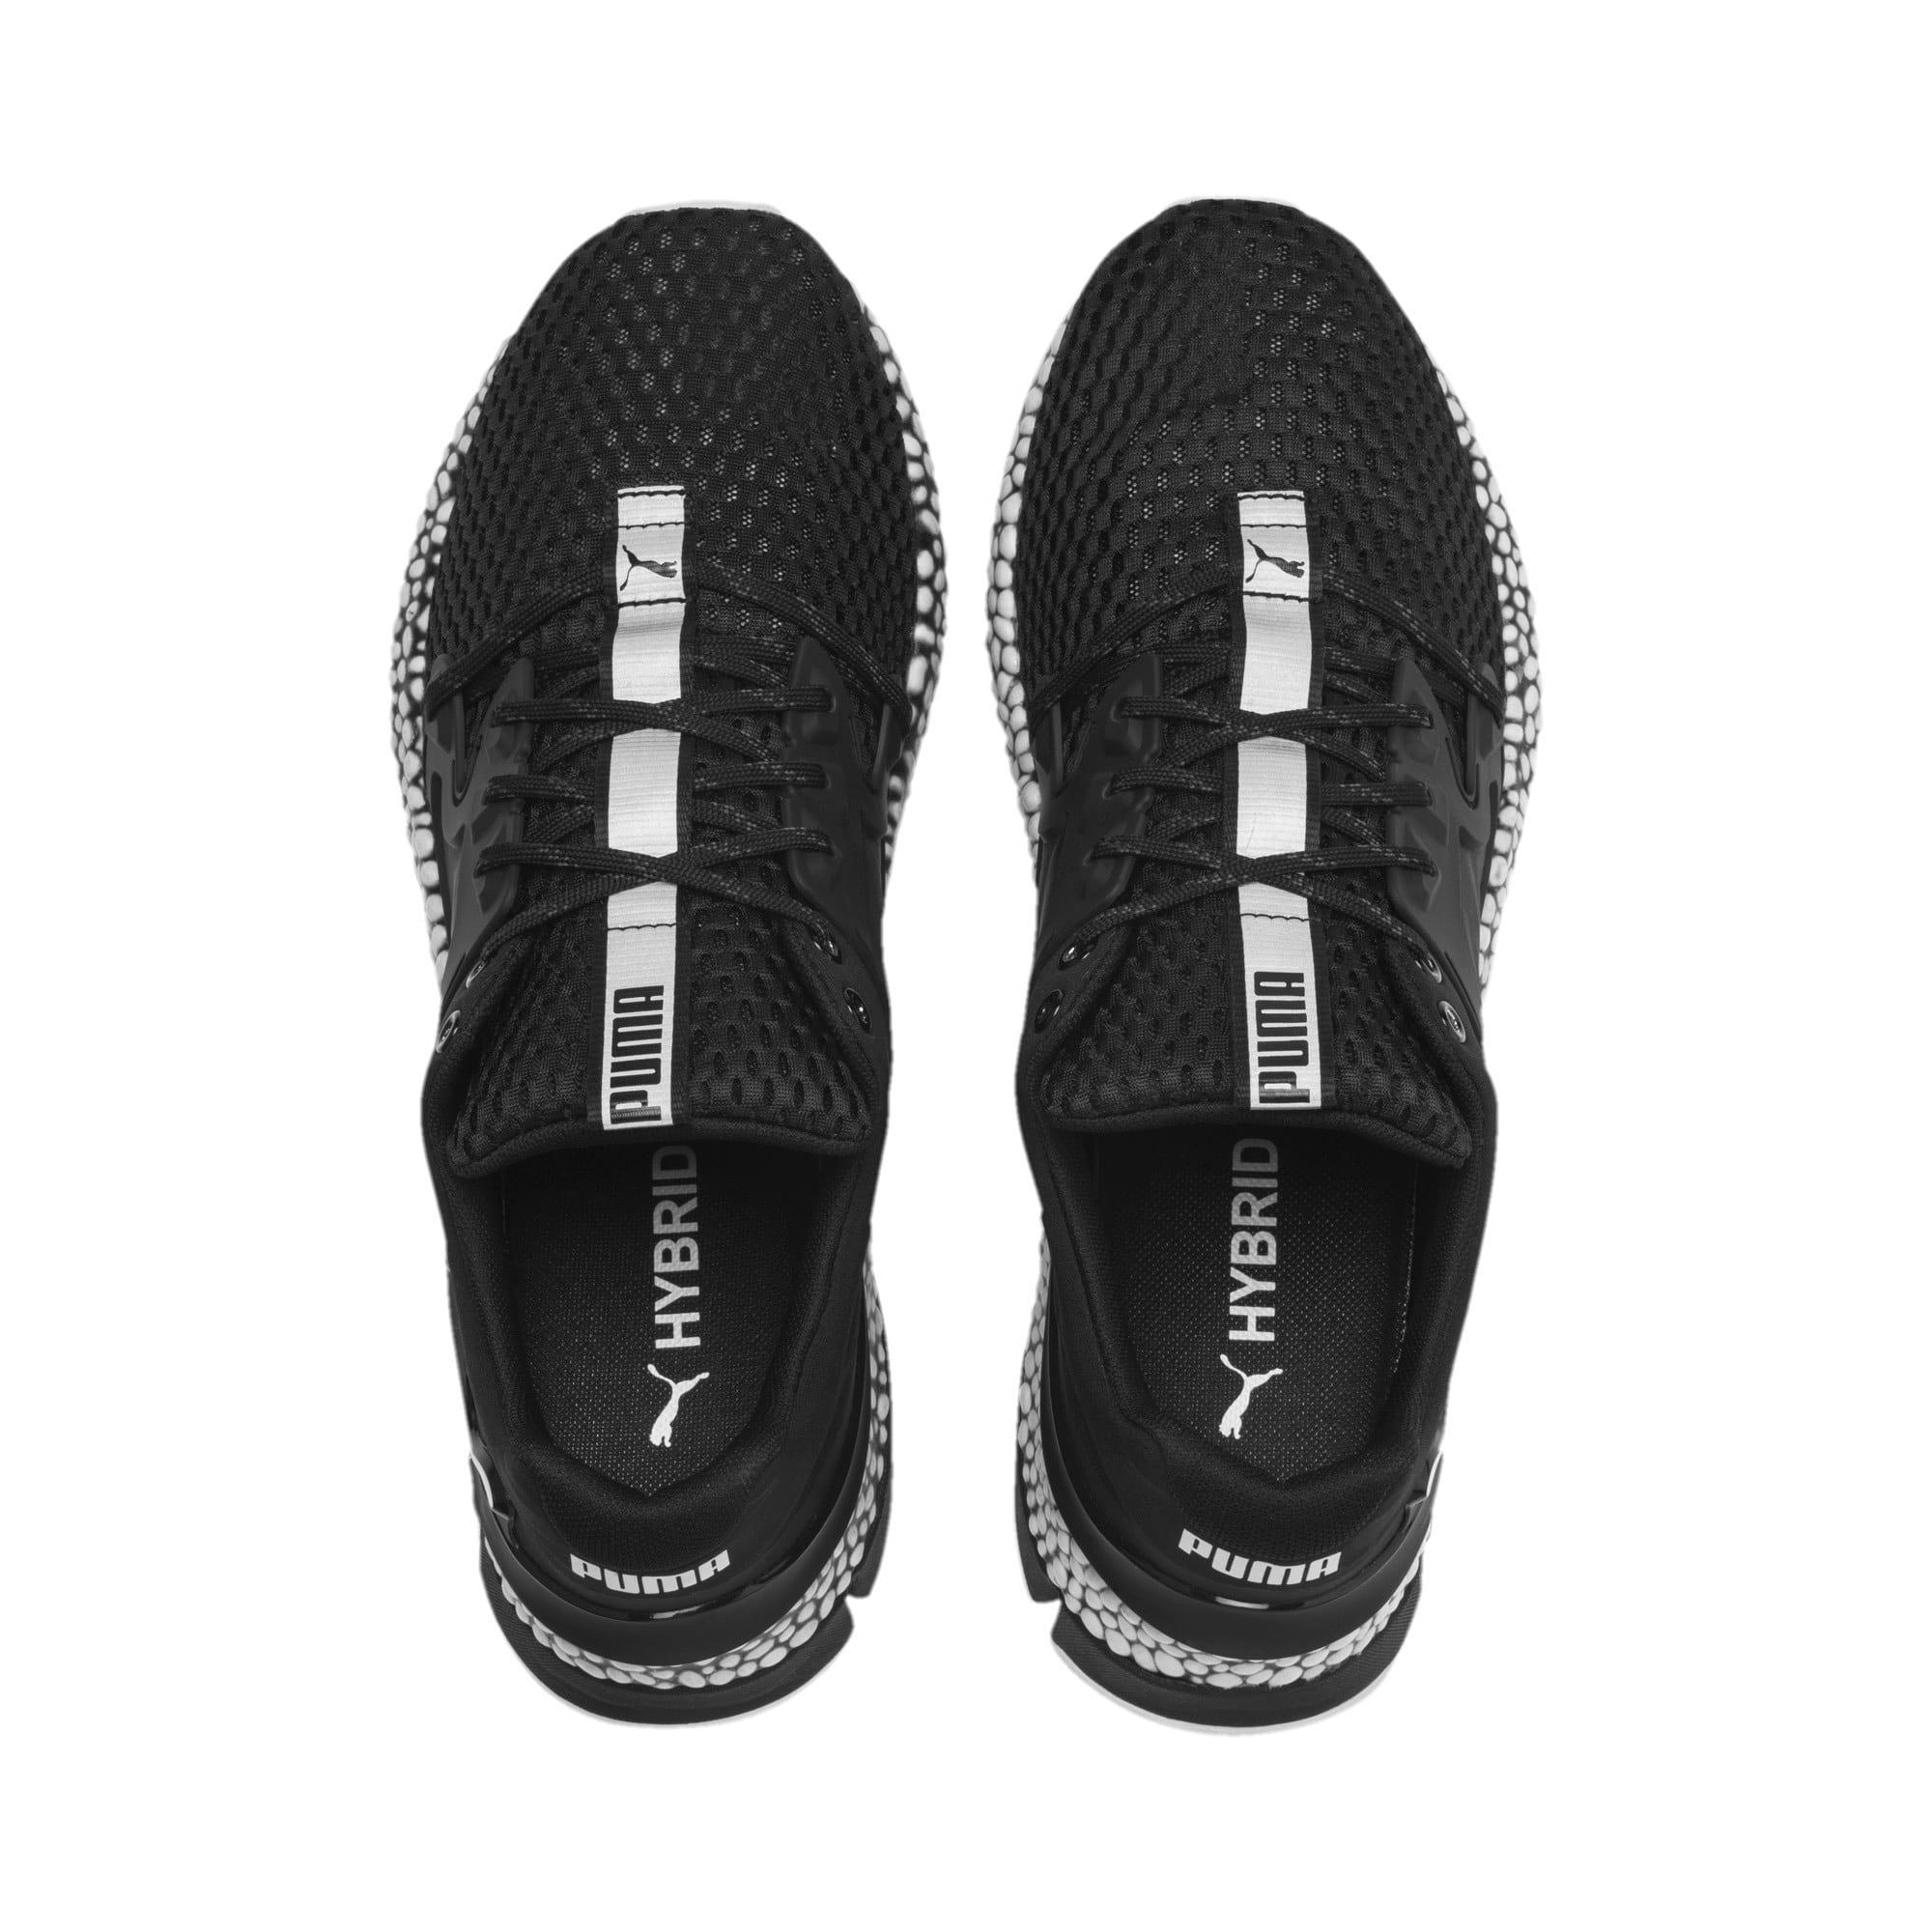 Thumbnail 7 of HYBRID Sky Men's Running Shoes, Puma Black-Puma White, medium